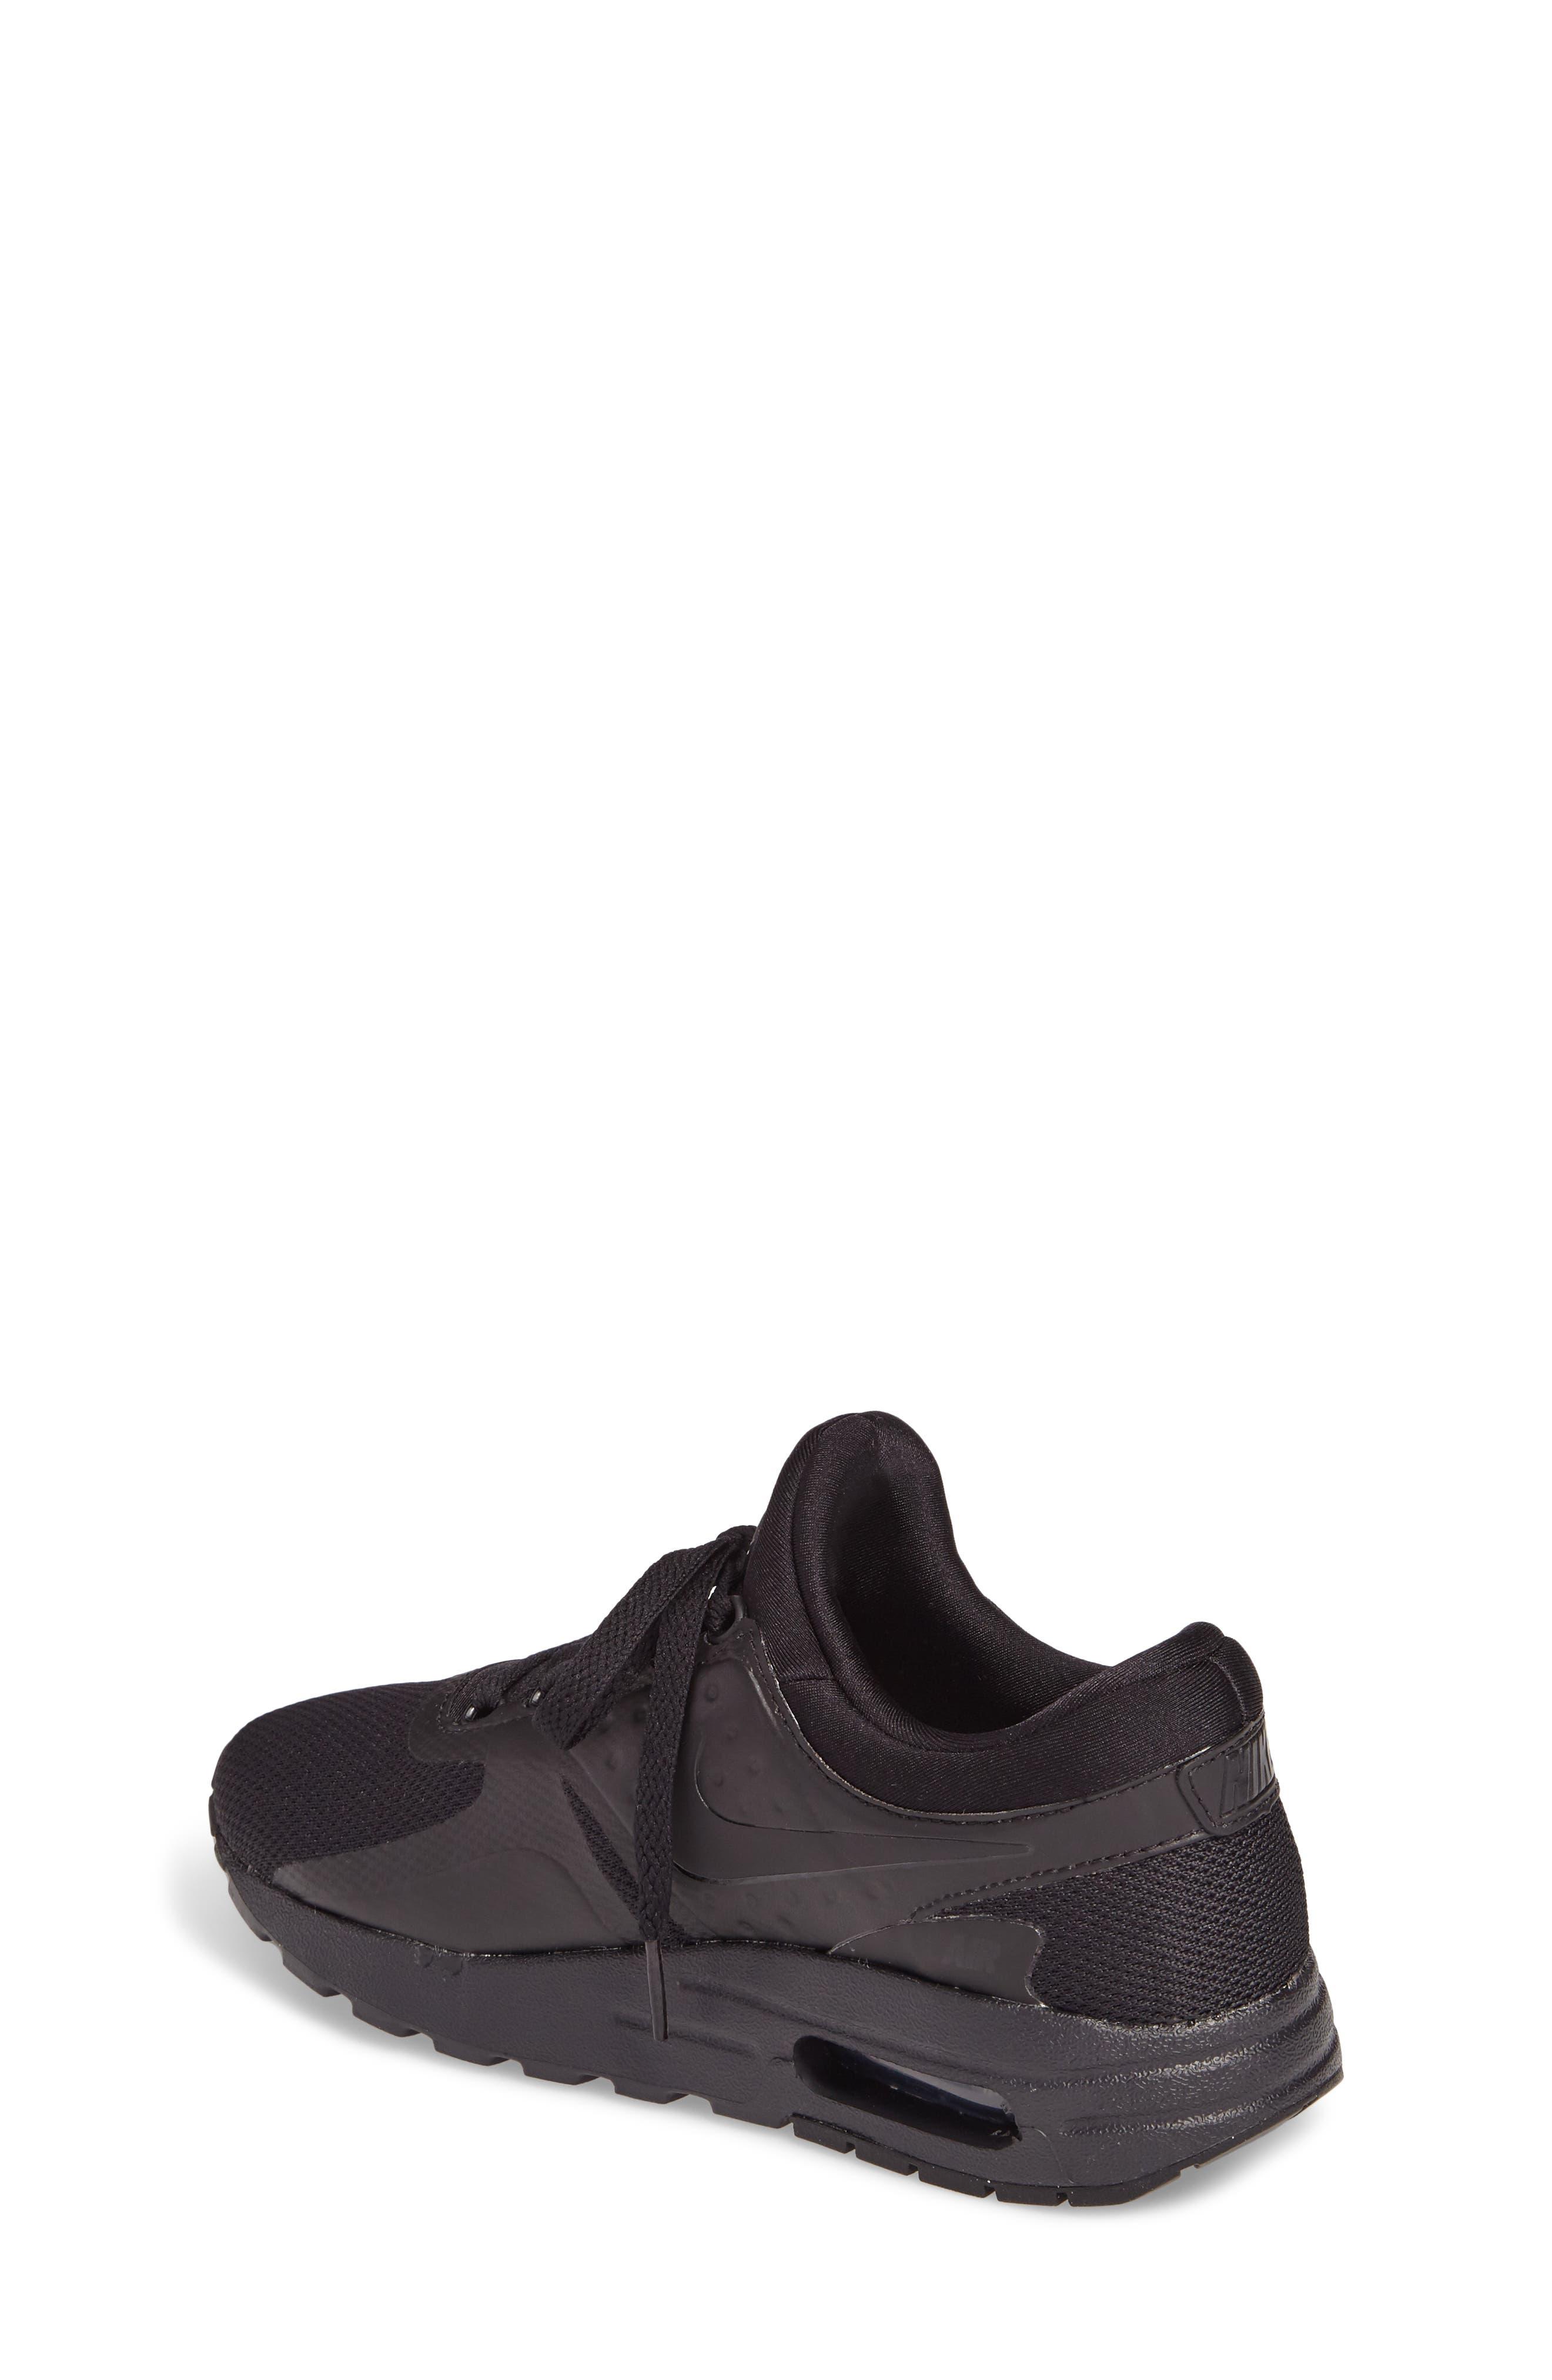 Air Max Zero Essential Sneaker,                             Alternate thumbnail 2, color,                             006